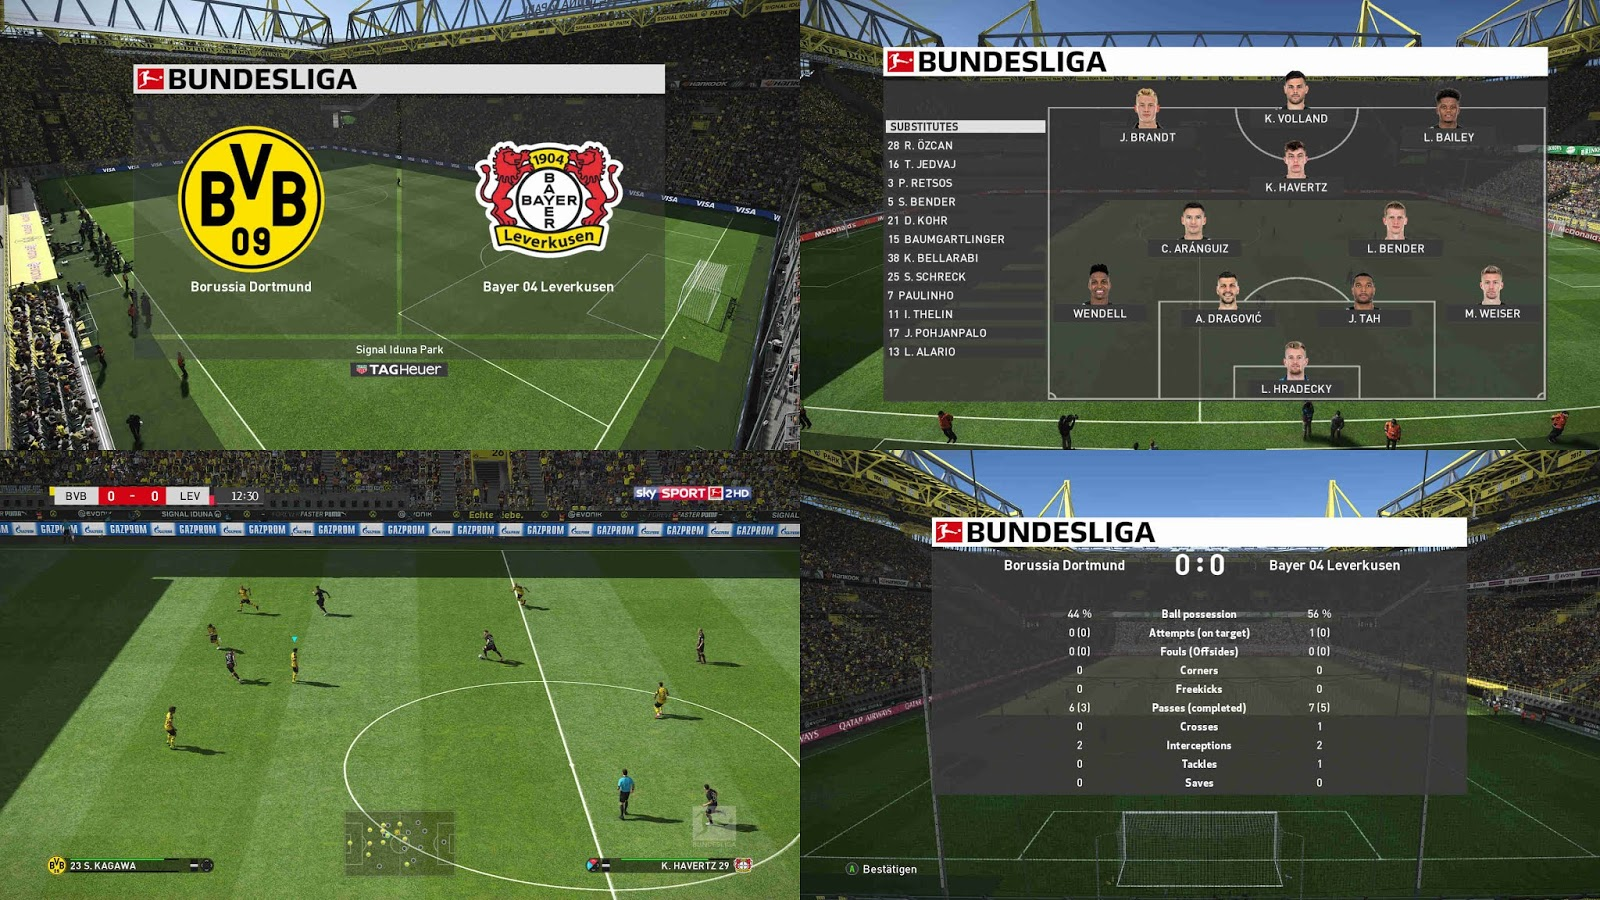 PES 2019 Scoreboard Bundesliga v2 1 1 by 1002MB